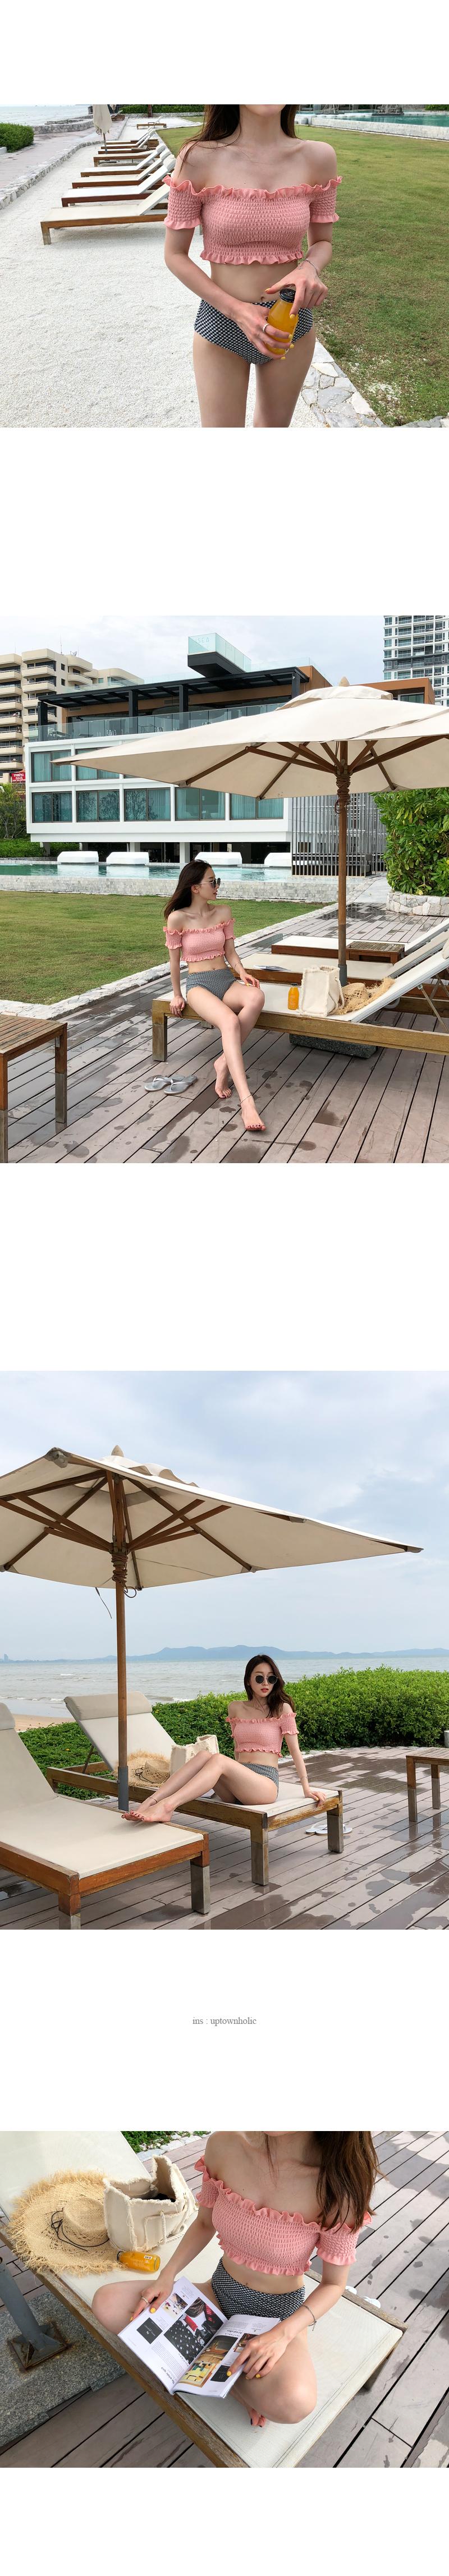 April bikini